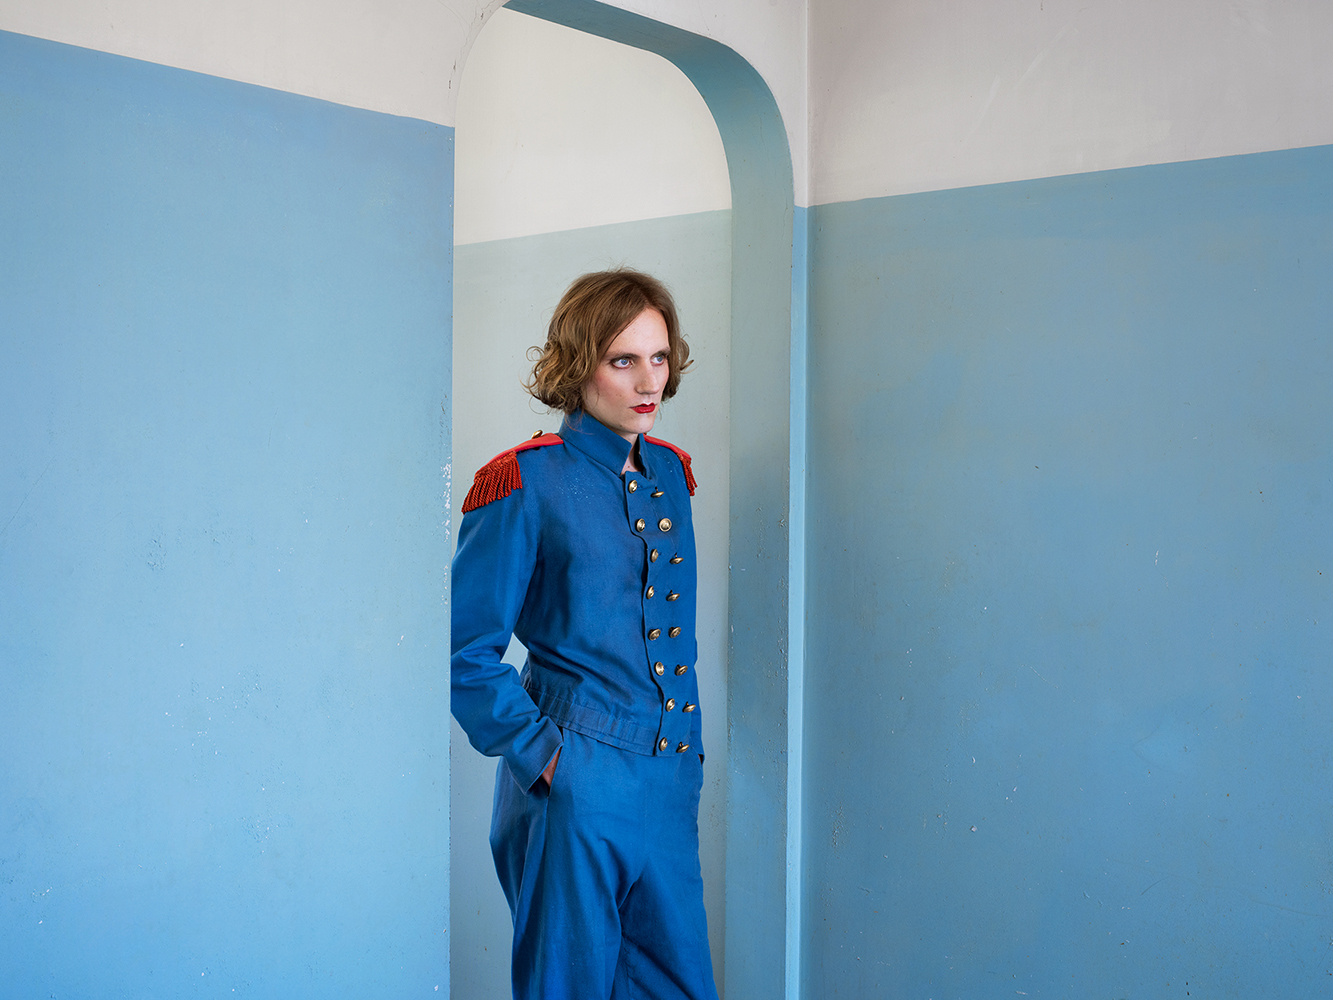 Uniform  Courtesy of ClampArt, New York © Lissa Rivera